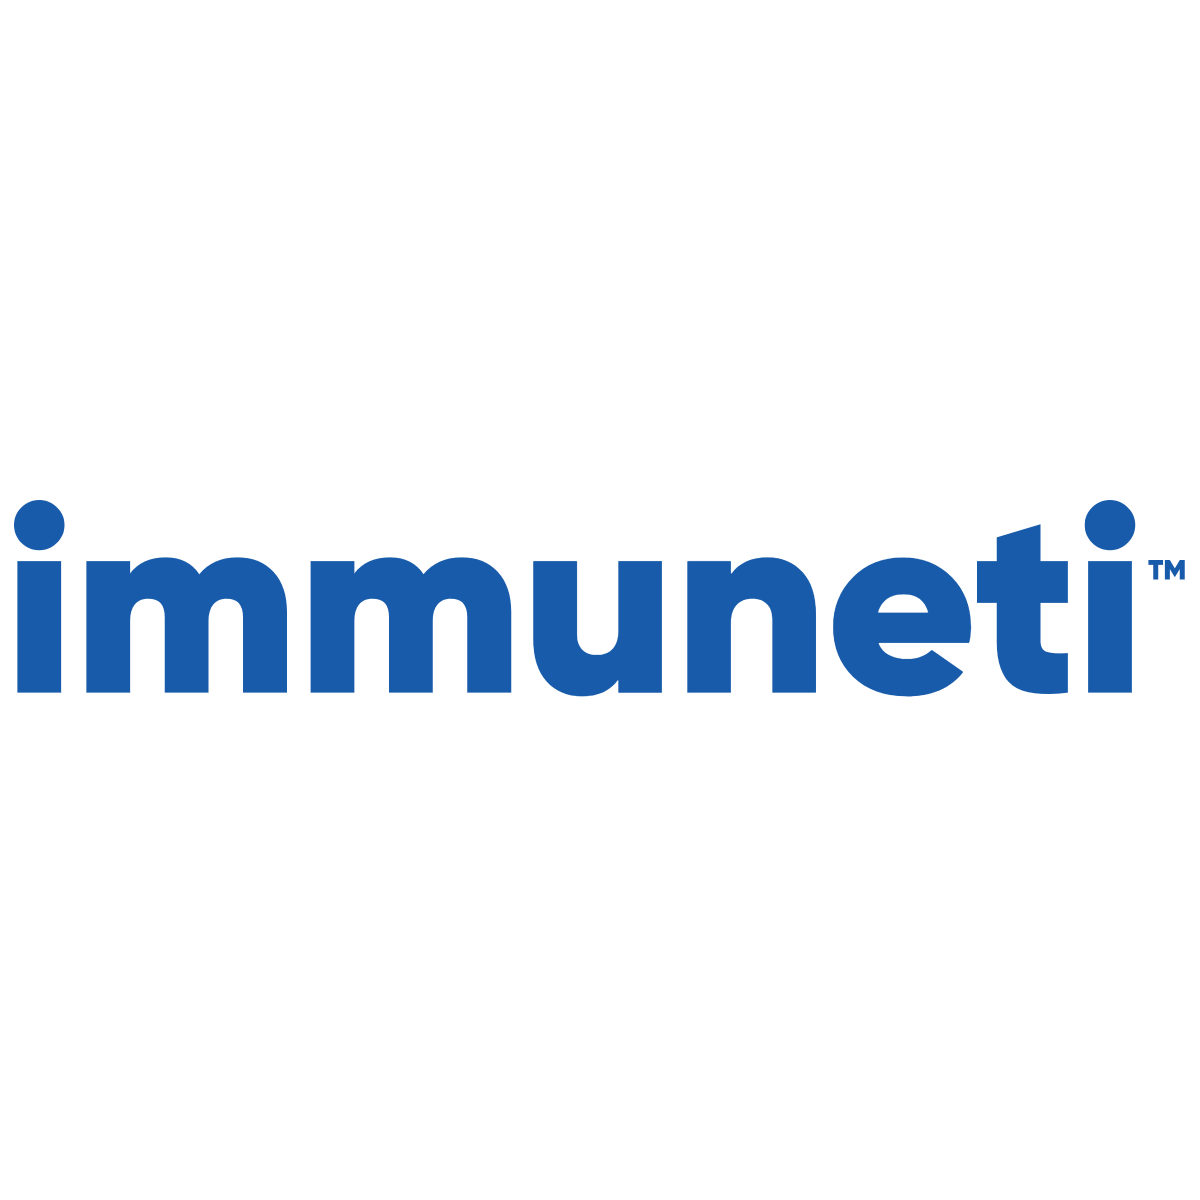 immuneti store page logo test